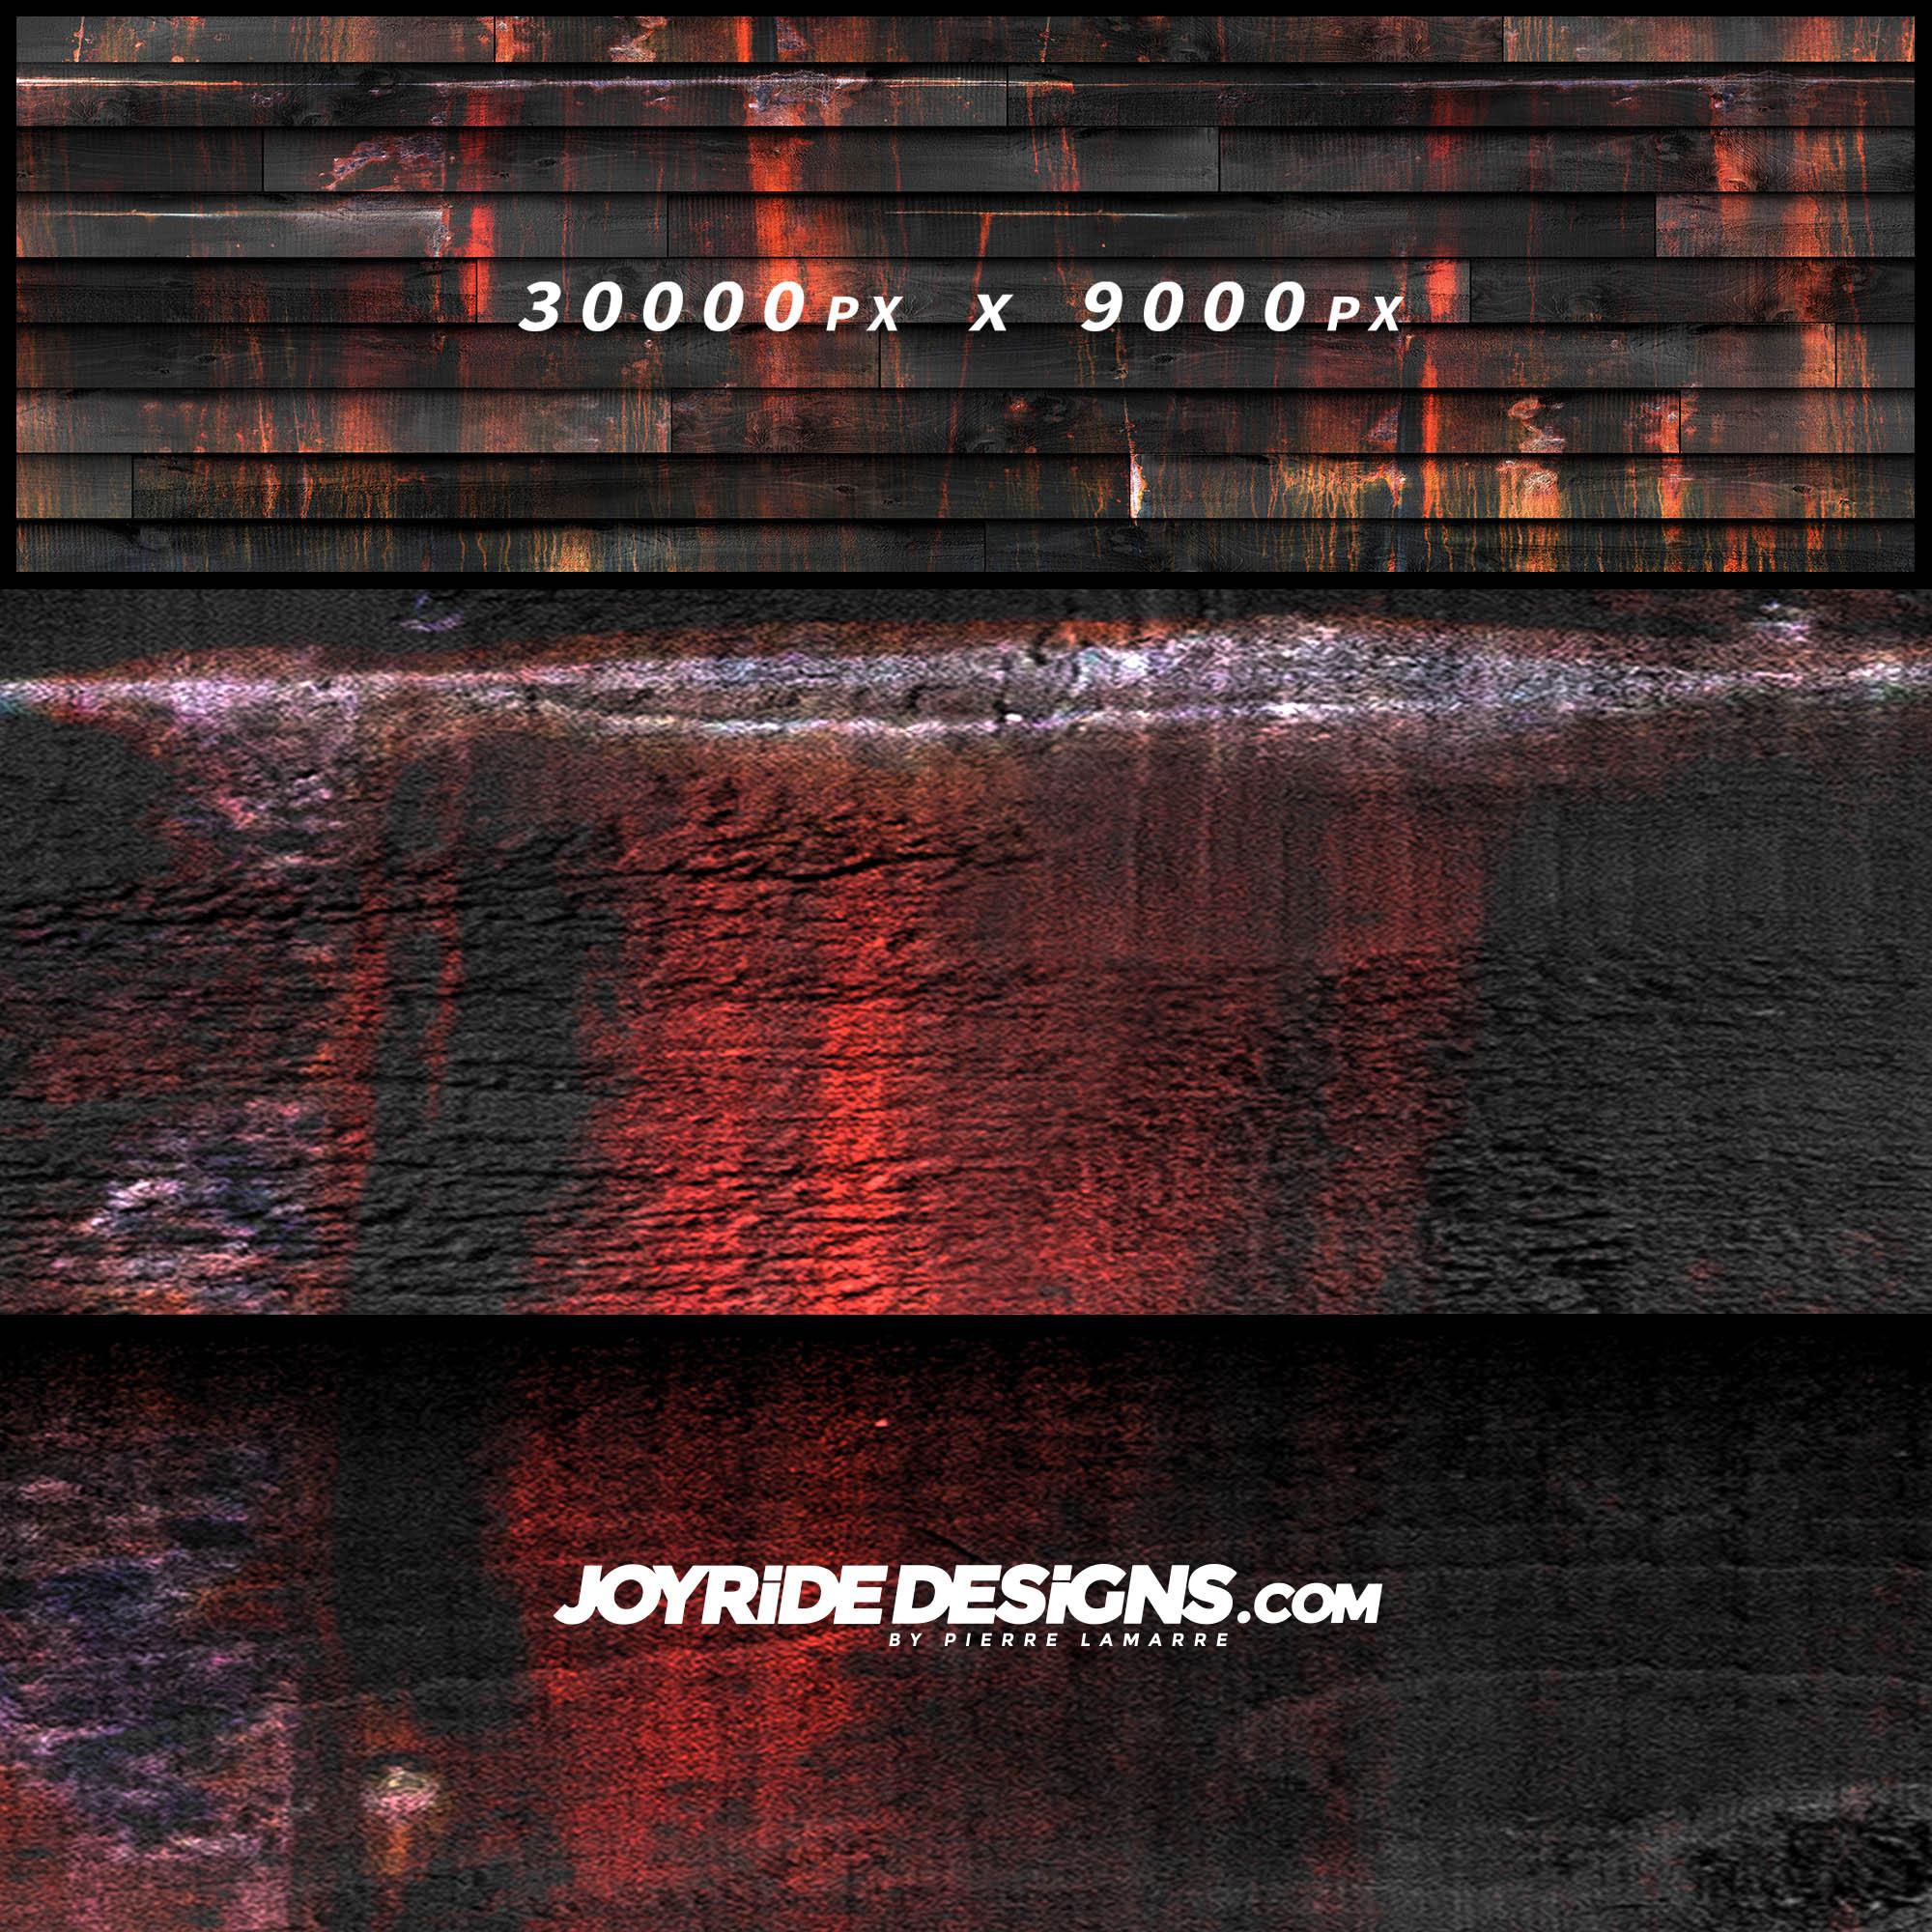 JOYRIDE PIRATE BLACK WOOD TEXTURE WRAP DESIGN JDT-10